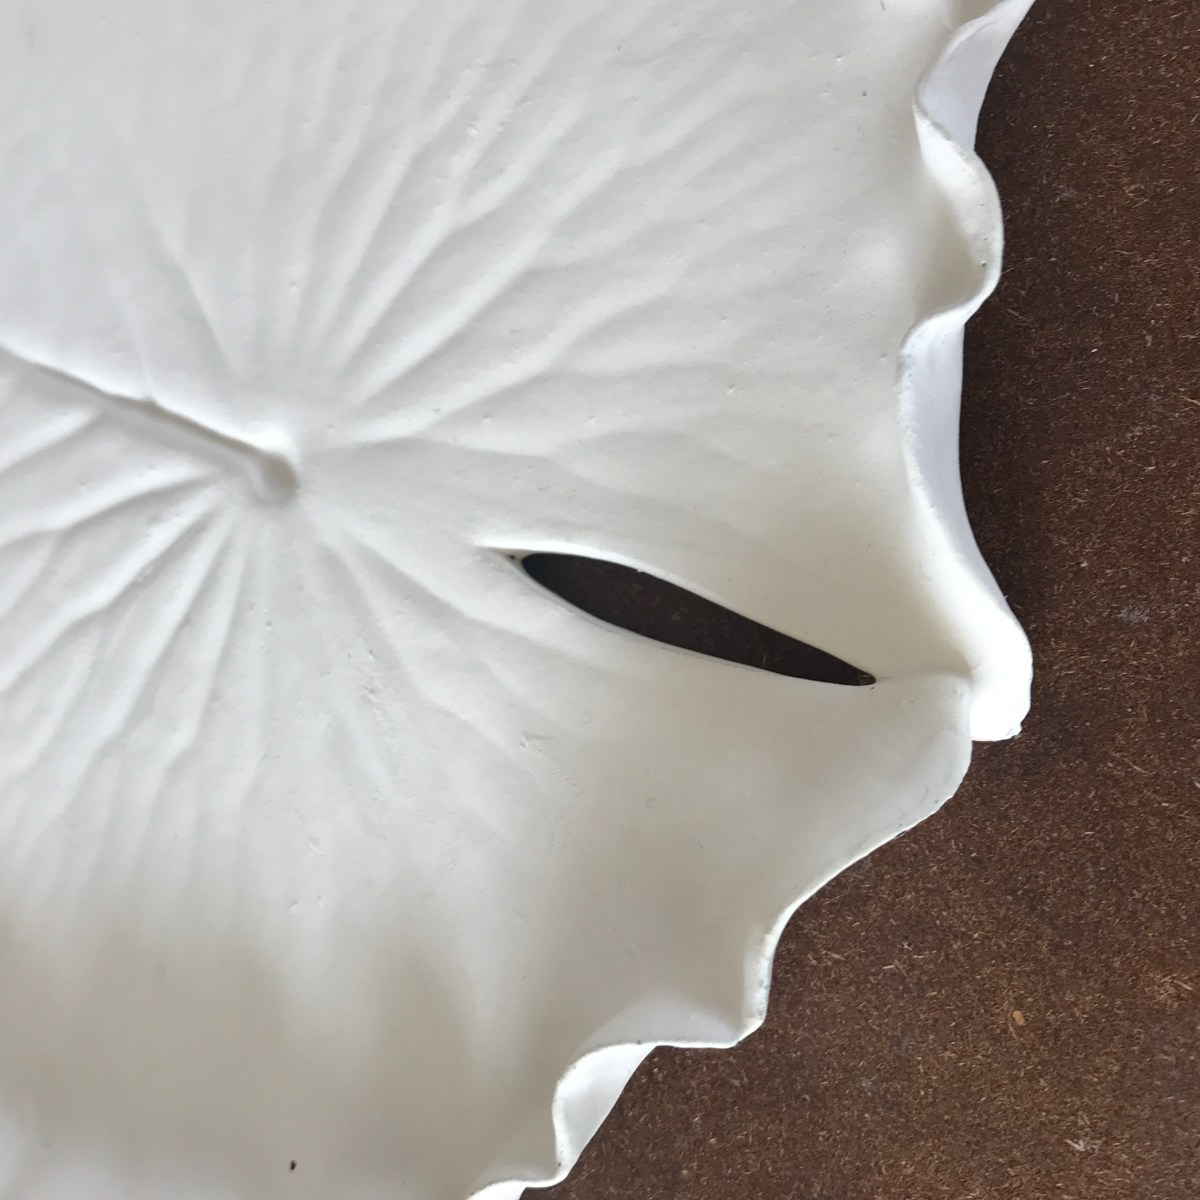 Pond Lily Leaf Dessert Dishes by Sonya Ceramic Art 'Raw Glaze Stage'